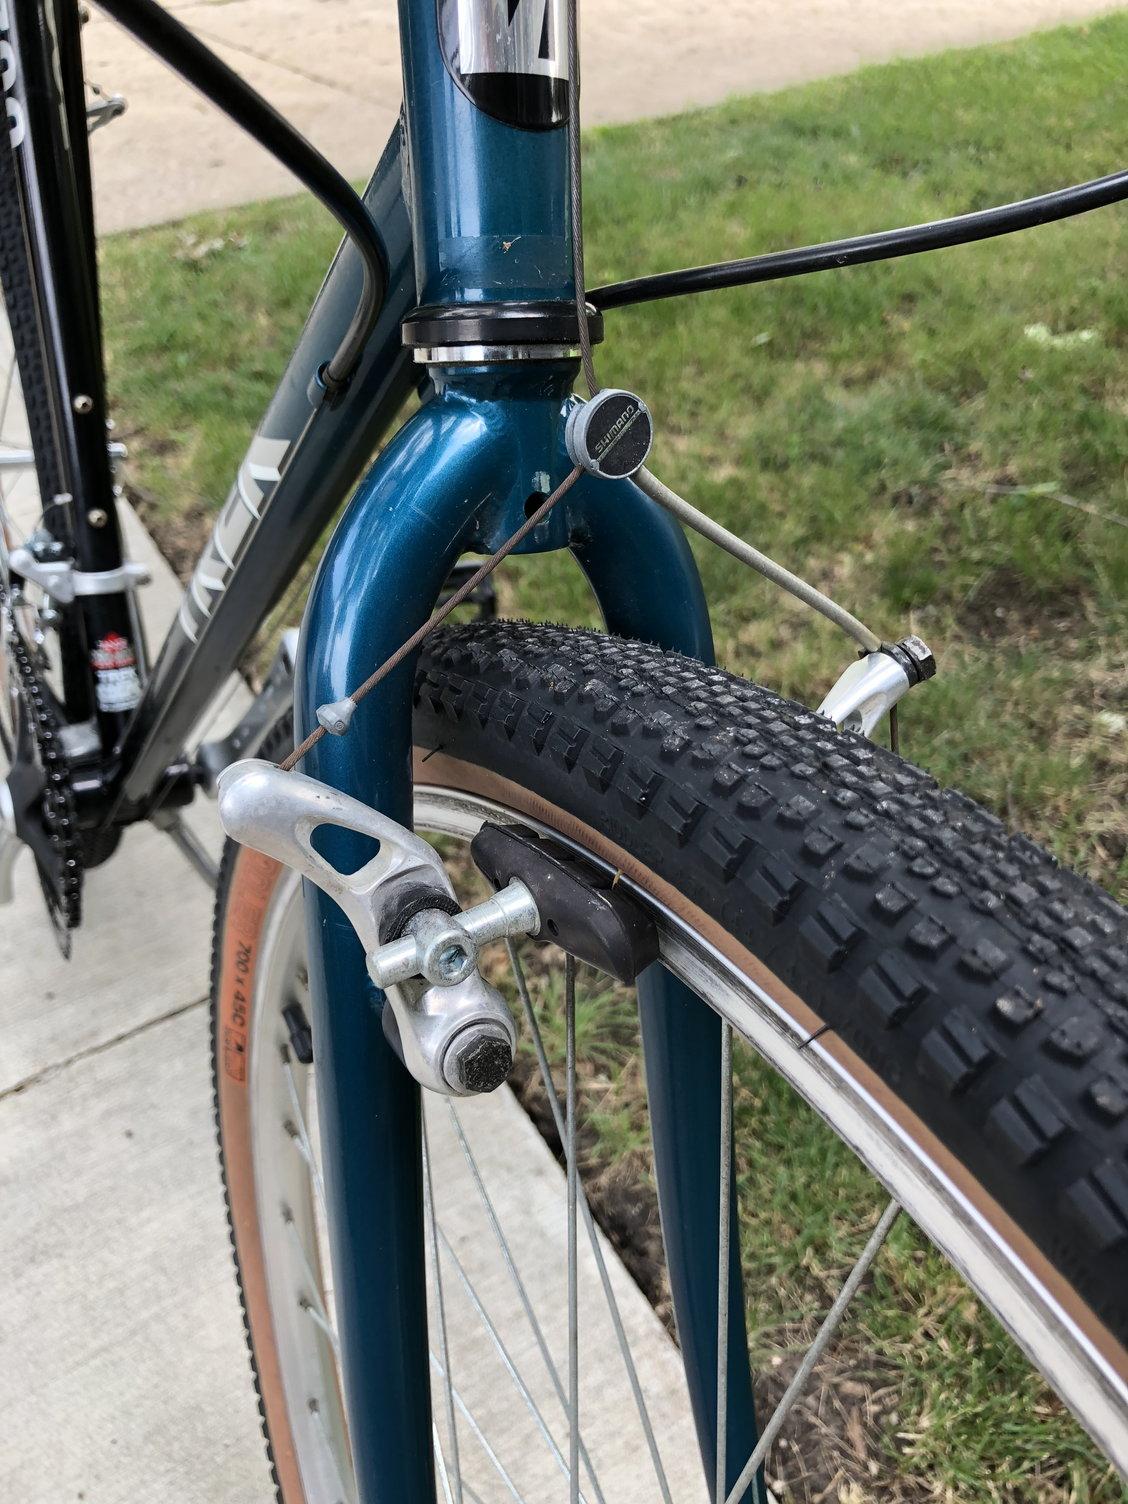 Show your Trek Multitrack! - Page 2 - Bike Forums